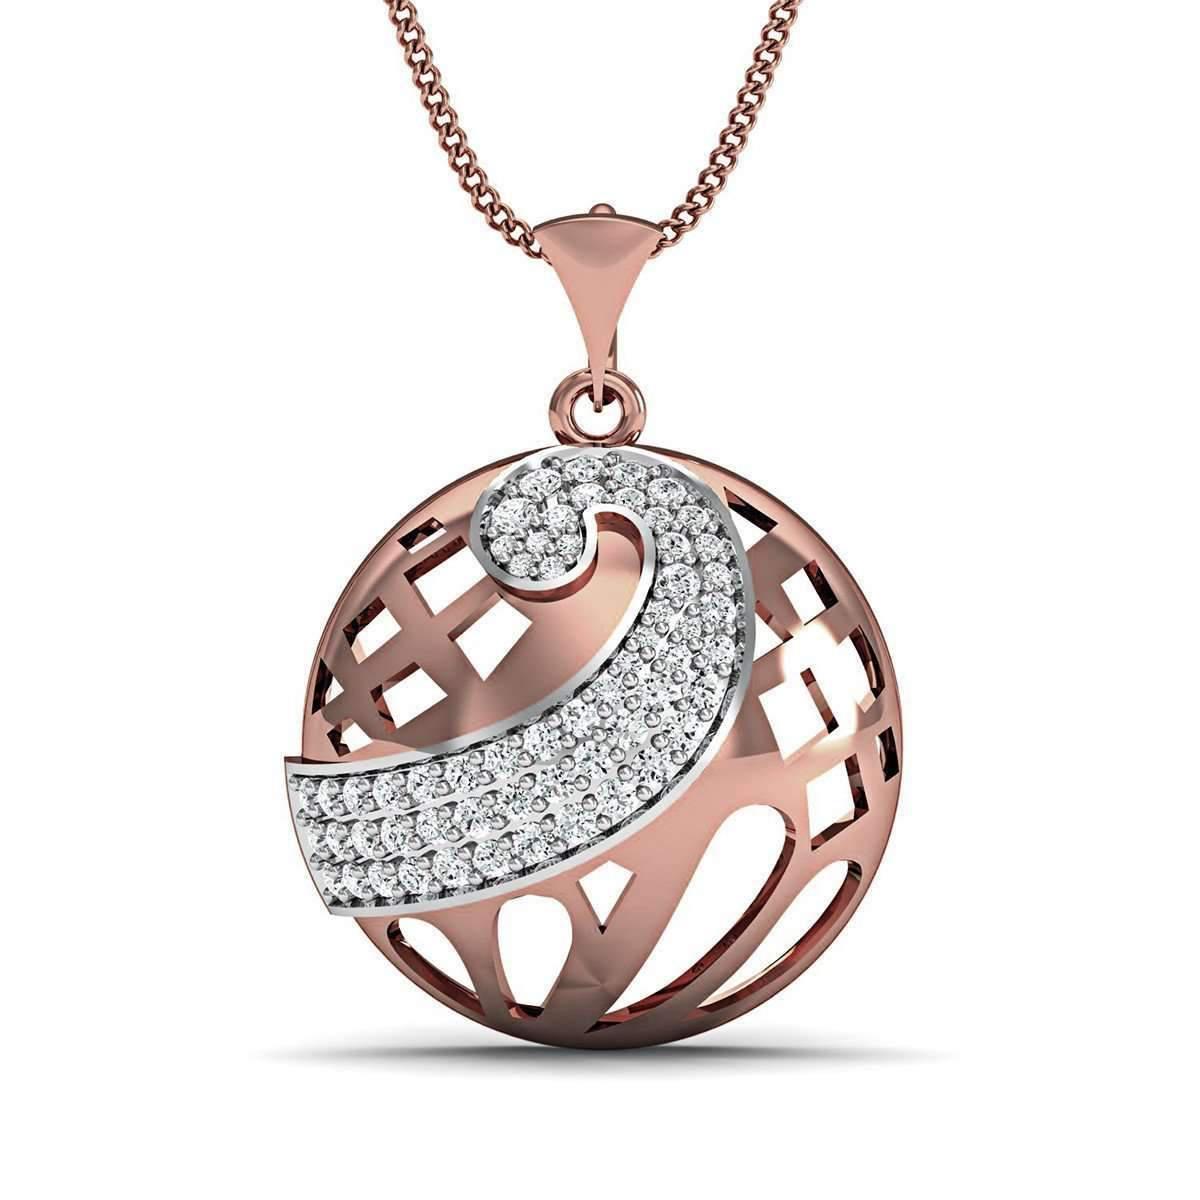 Diamoire Jewels 18kt Rose Gold Diamond Pave Pendant atpBbOIqm